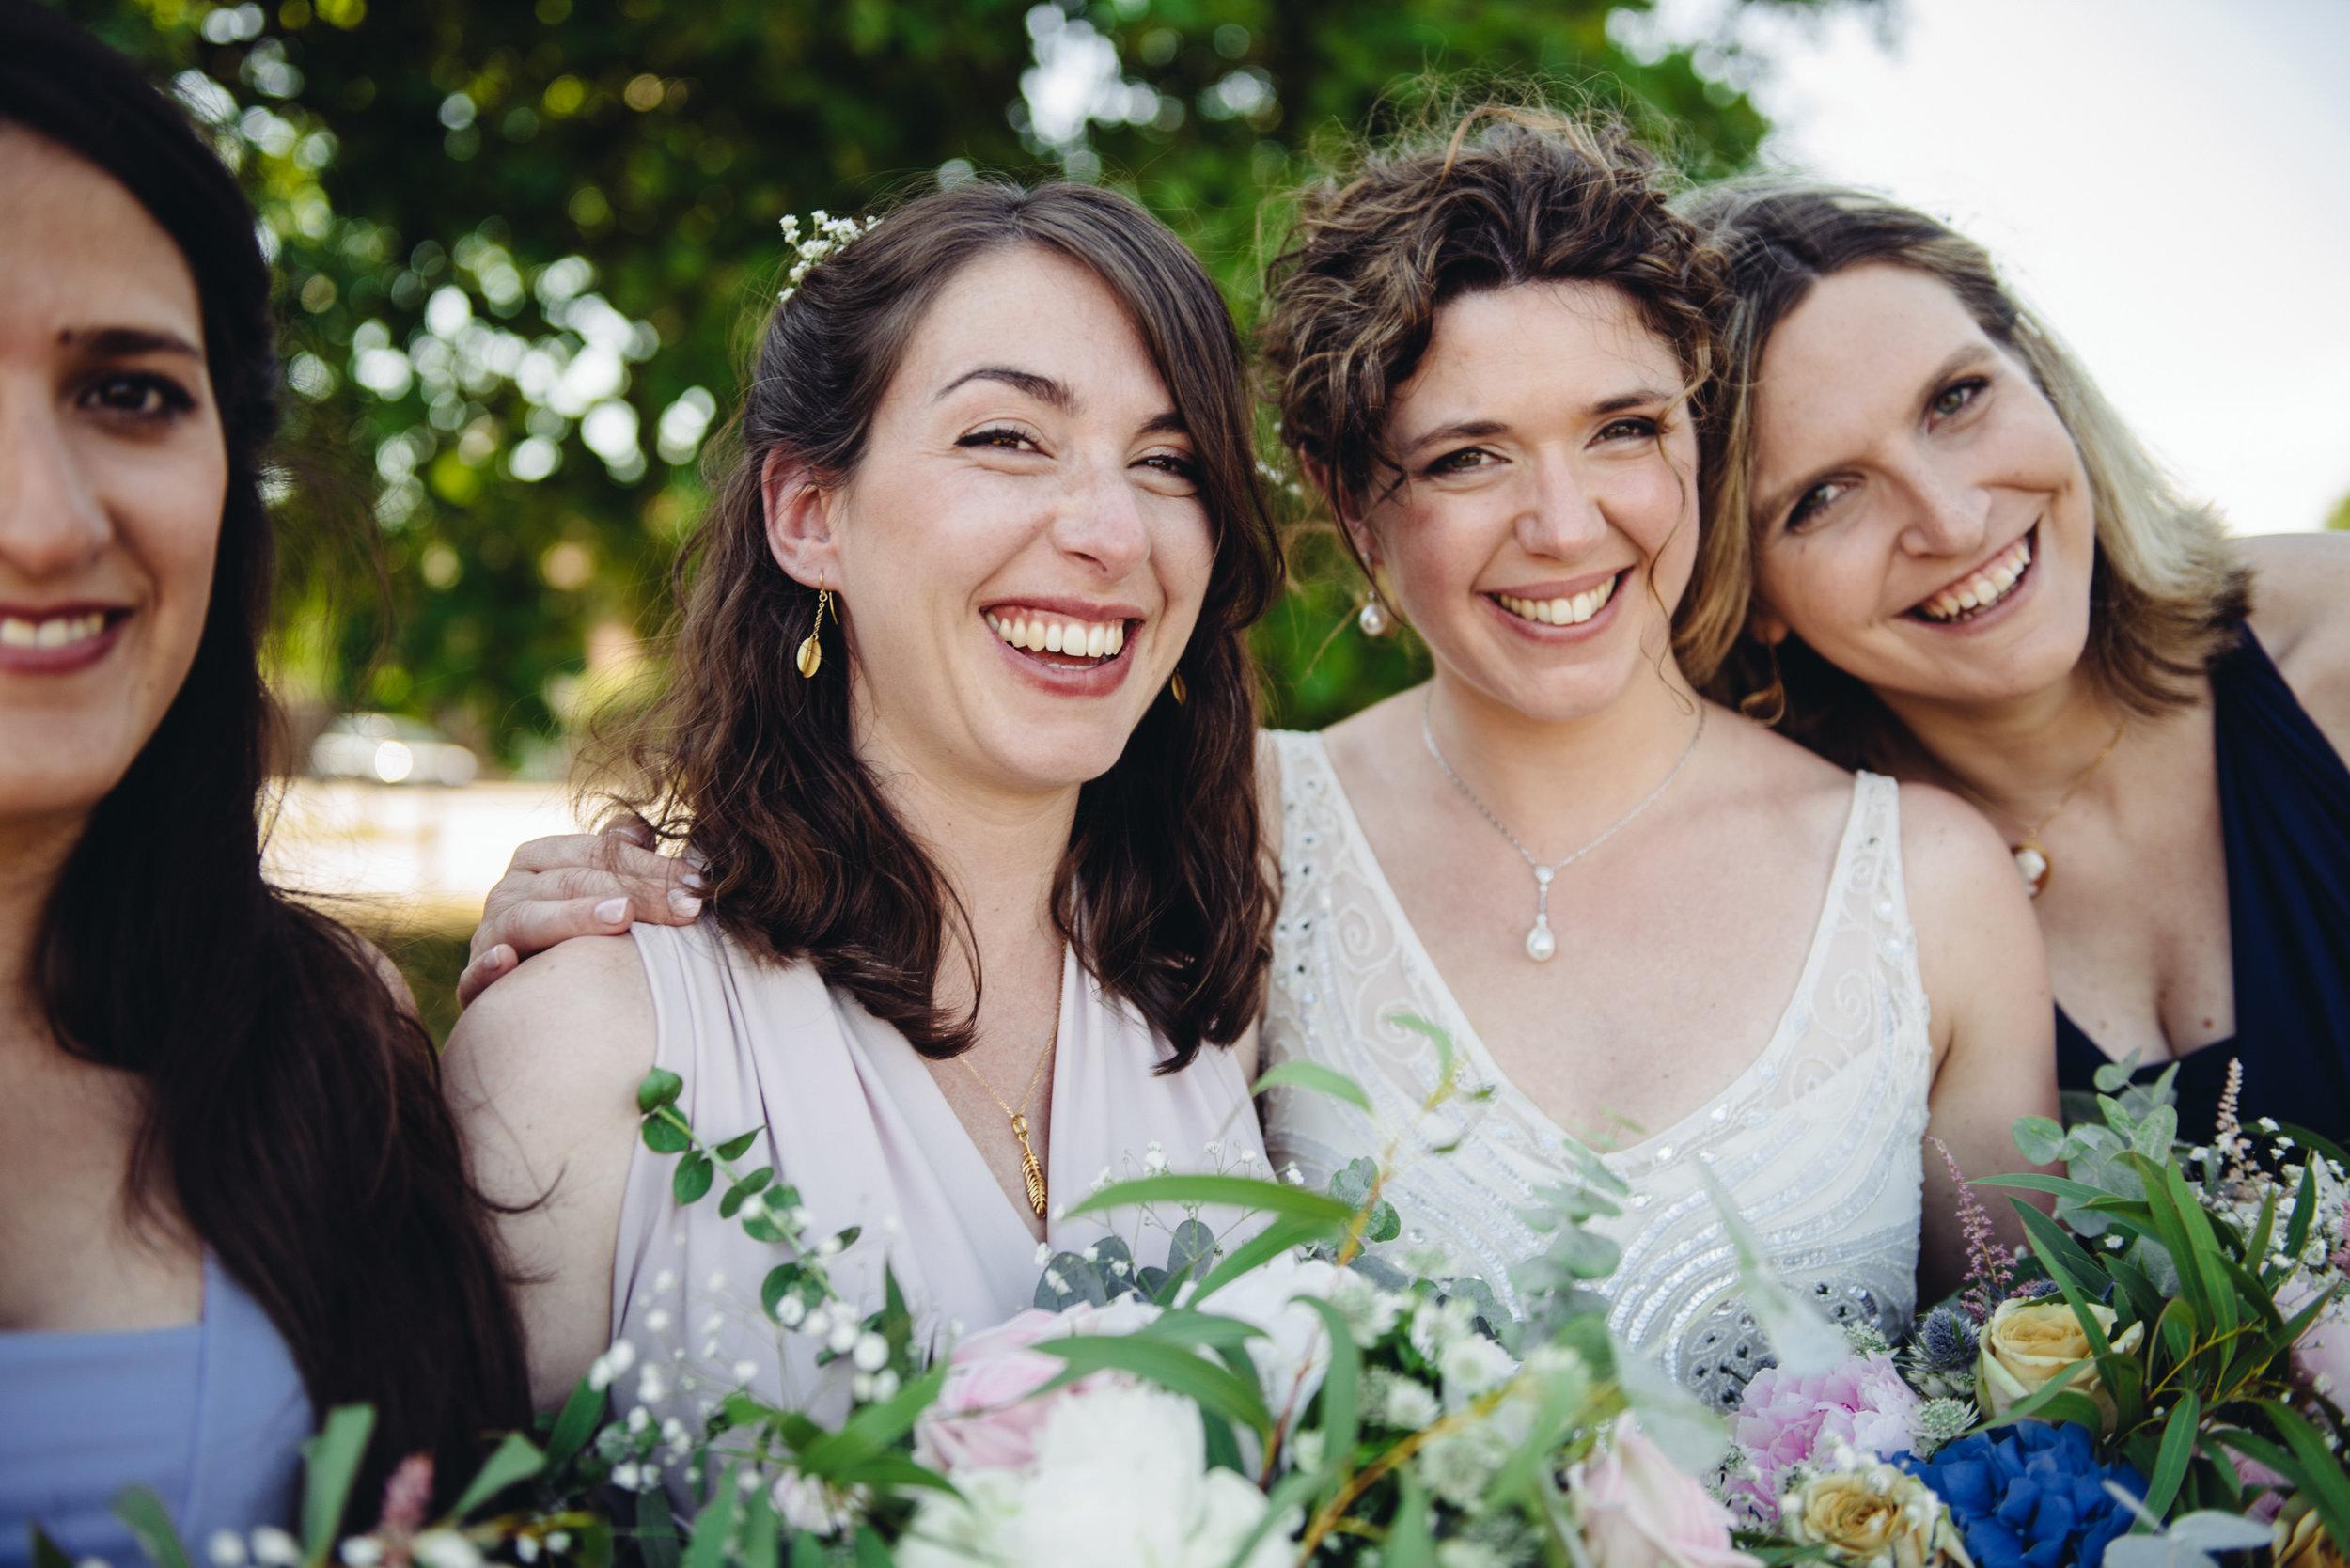 0217-LISA-DEVINE-PHOTOGRAPHY-ALTERNATIVE-WEDDING-PHOTOGRAPHY-SCOTLAND-DESTINATION-WEDDINGS-GLASGOW-WEDDINGS-COOL-WEDDINGS-STYLISH-WEDDINGS.JPG